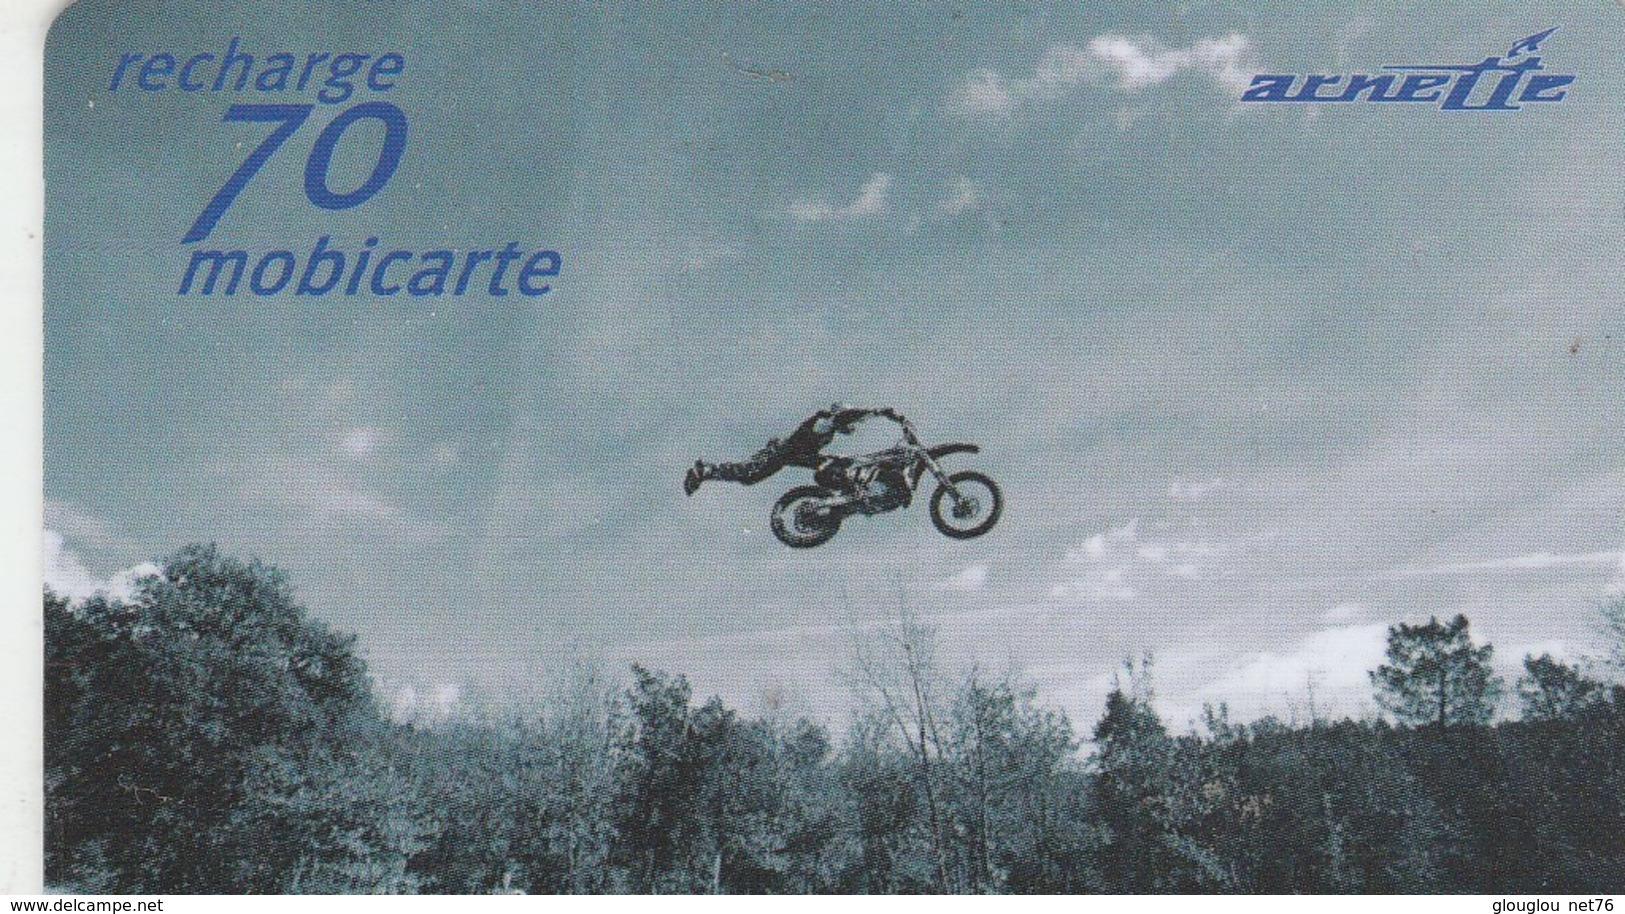 MOBICARTE...RECHARGE 70...ARNETTE - Mobicartes (recharges)